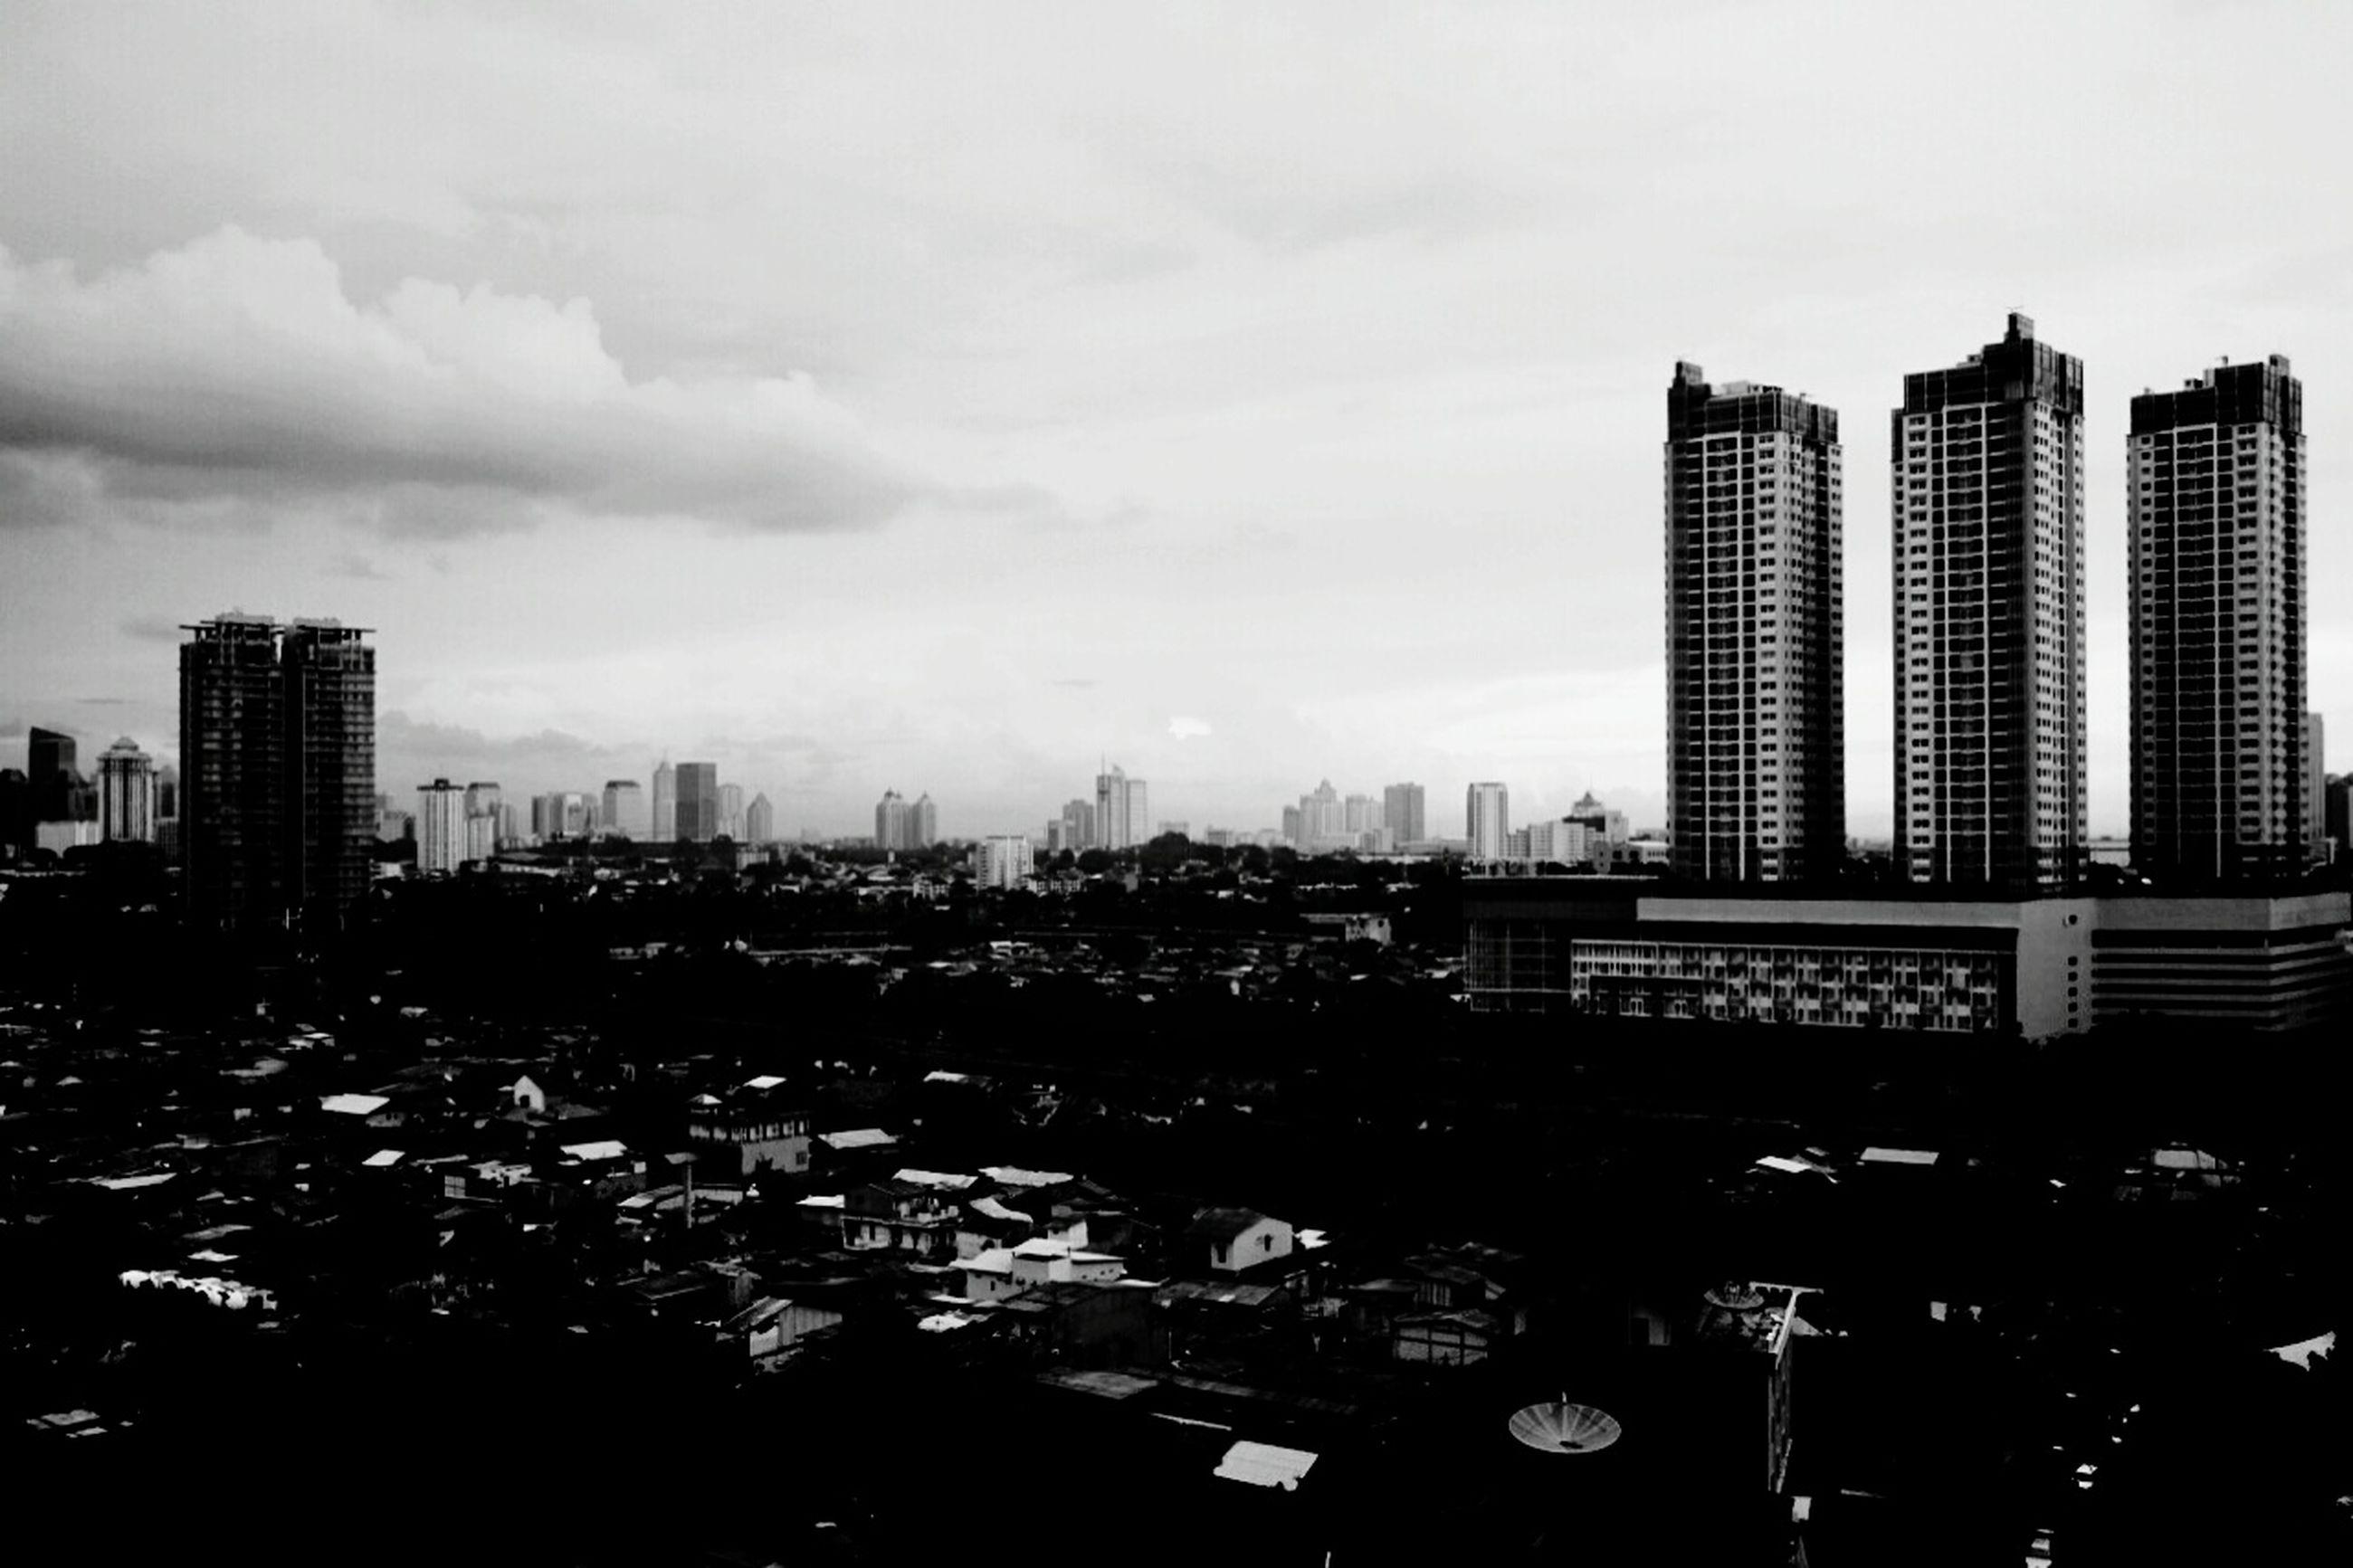 building exterior, city, architecture, built structure, sky, cityscape, skyscraper, cloud - sky, urban skyline, office building, modern, tower, tall - high, cloudy, city life, building, residential building, cloud, dusk, outdoors